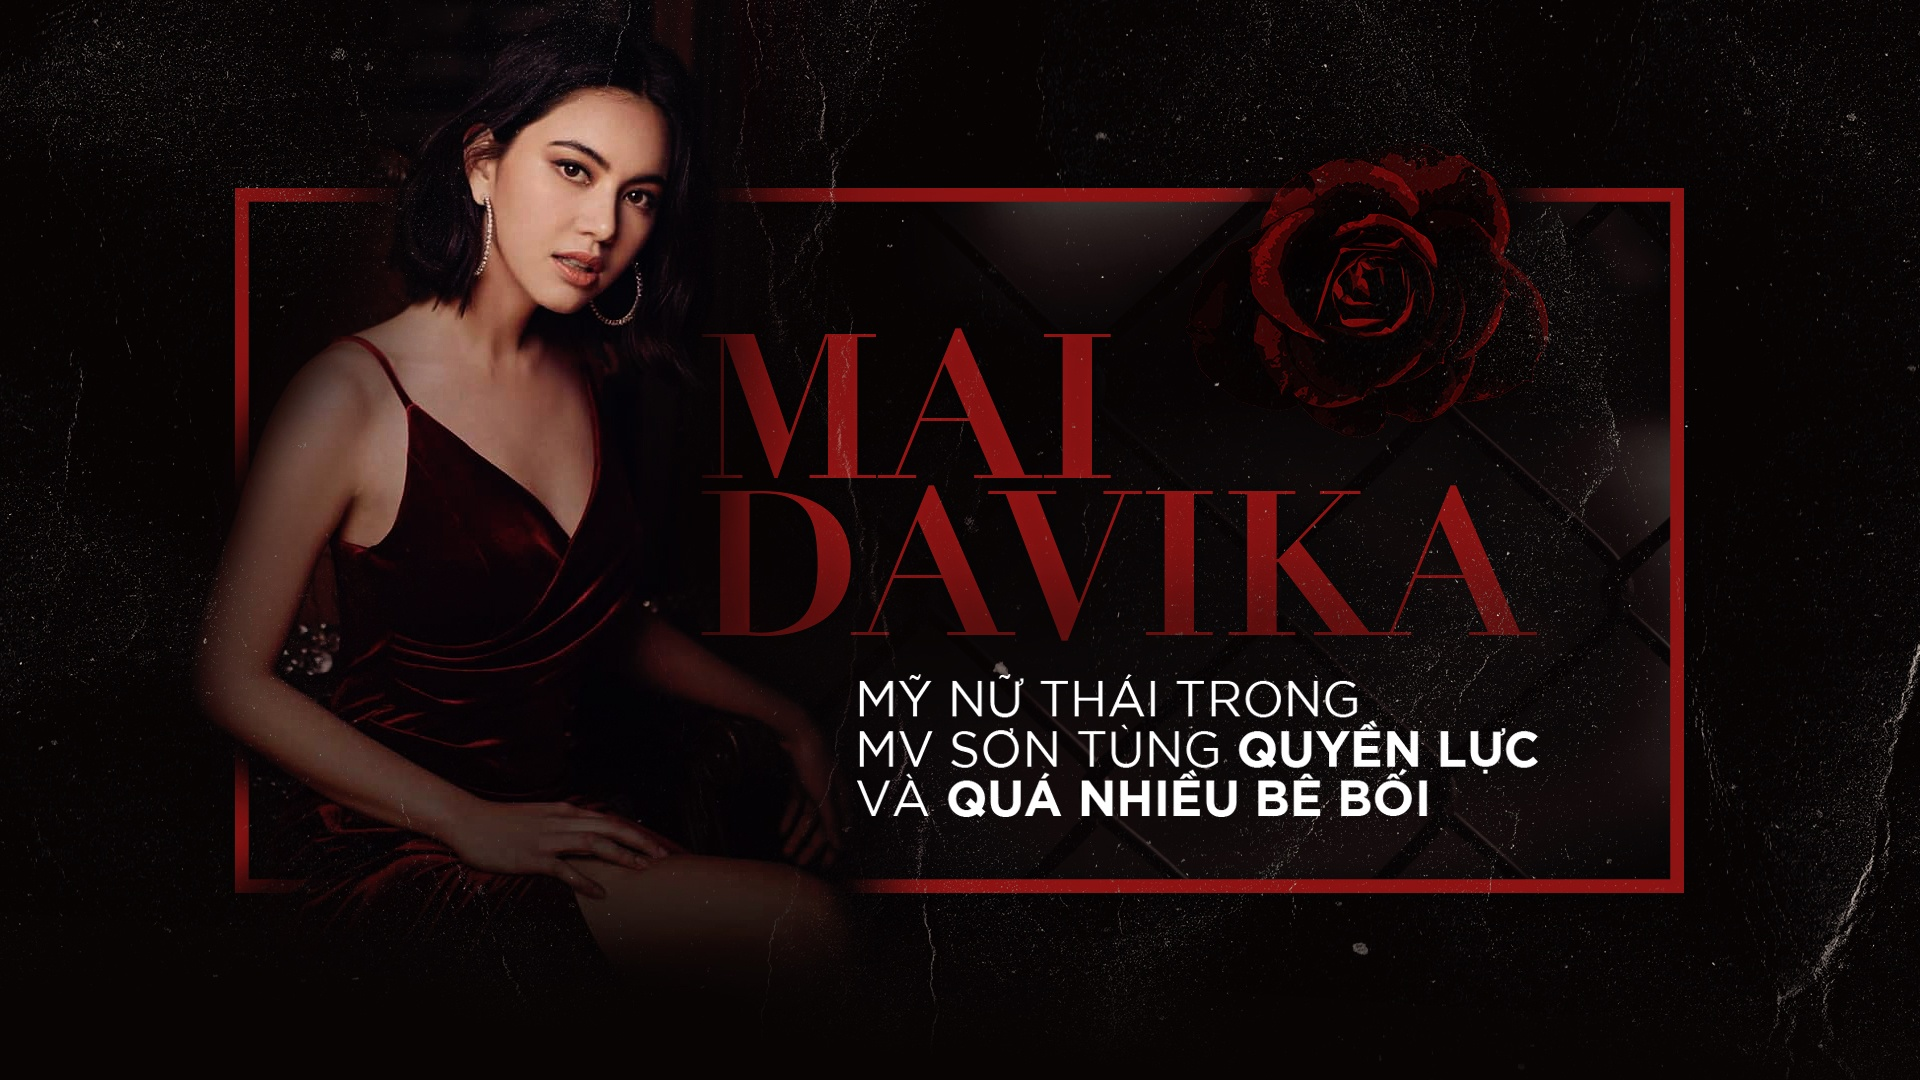 Mai Davika - My nu Thai trong MV Son Tung quyen luc va nhieu be boi hinh anh 2